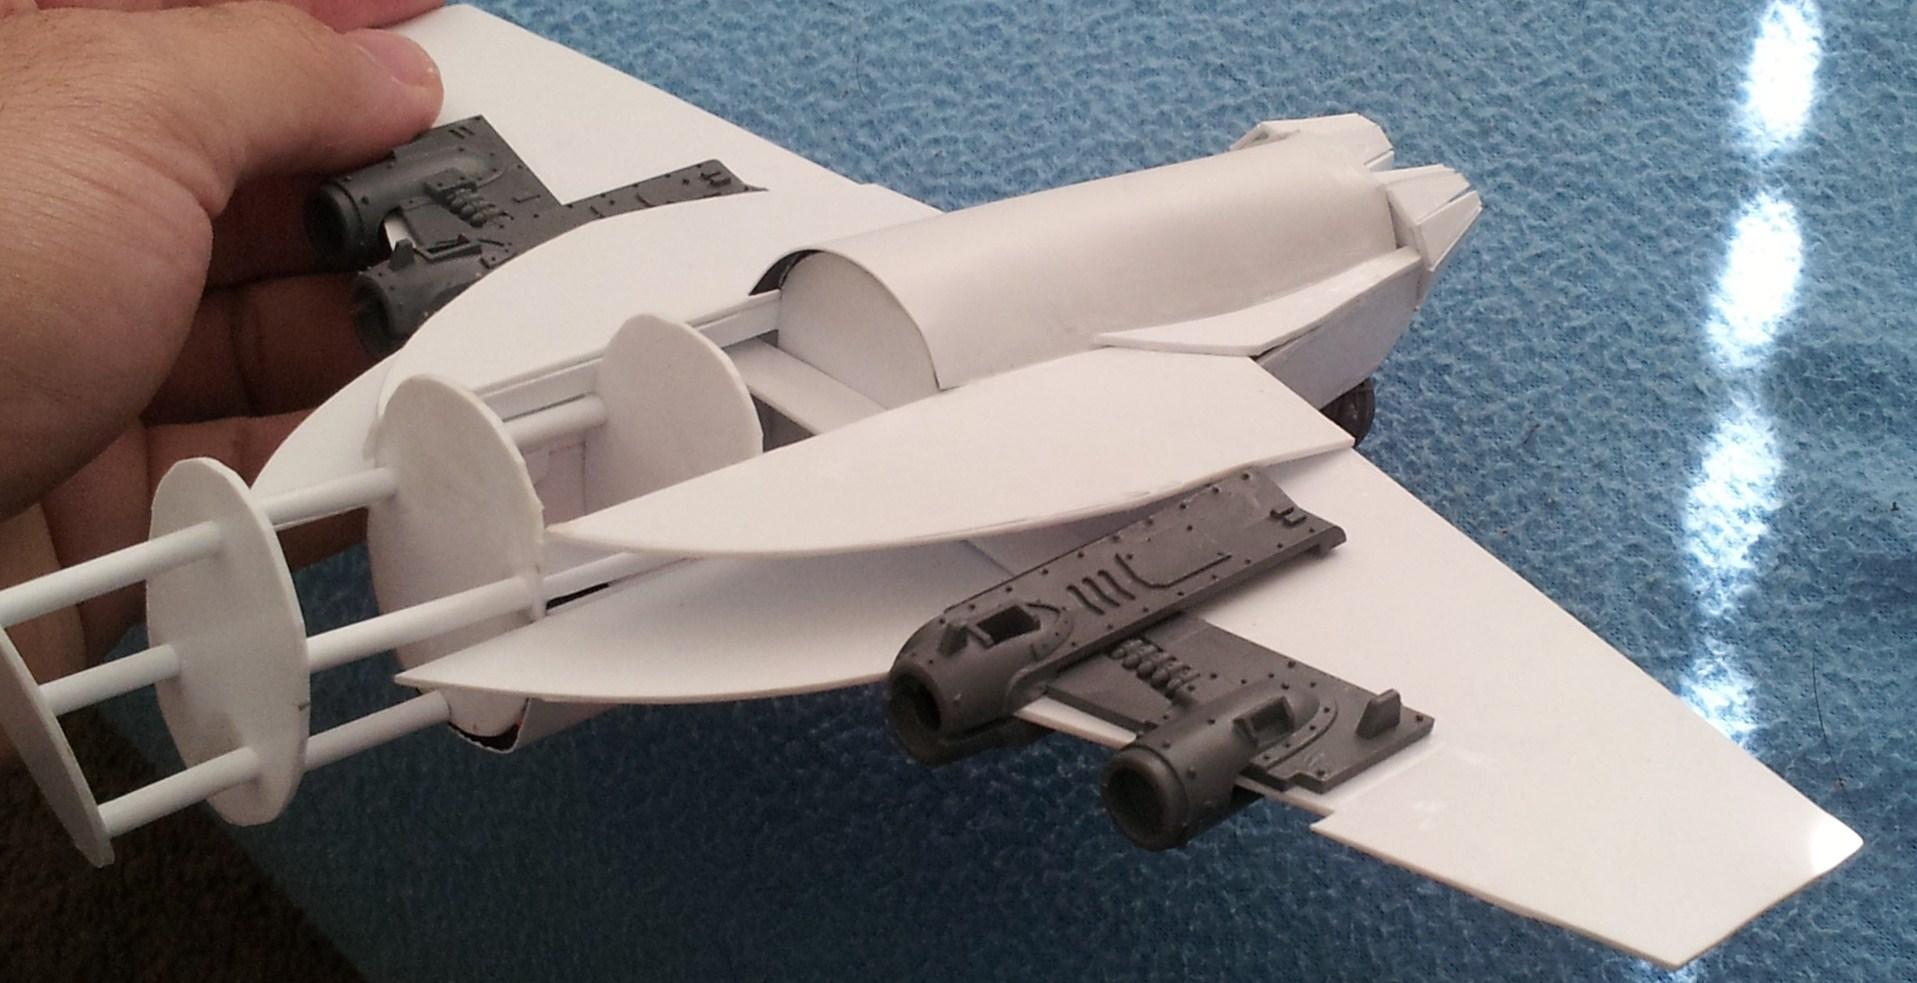 Conversion, Dakka Dakka, Dakkajet, F18, Hornet, Jet, Rhino